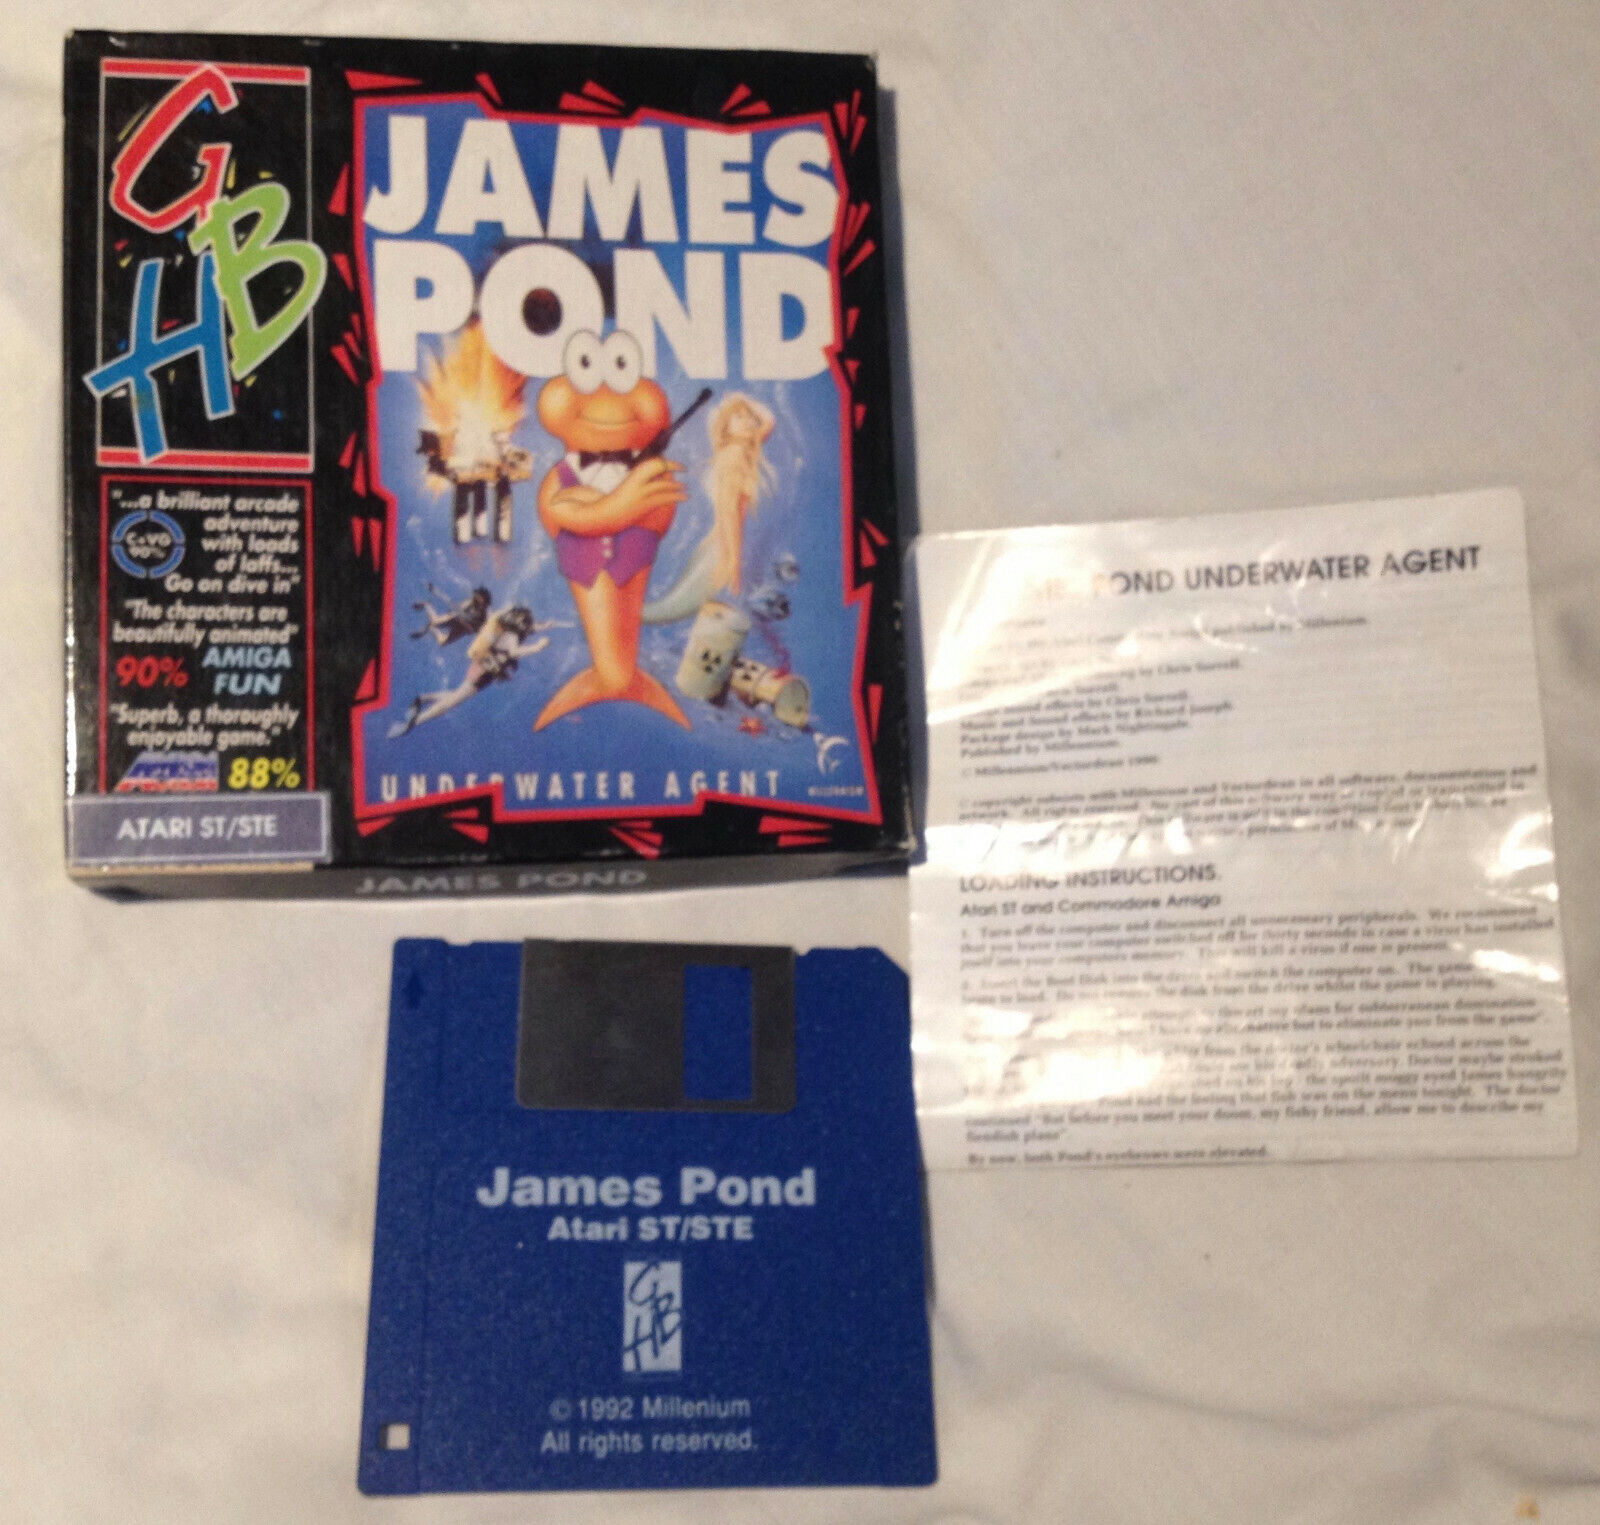 retro computer games - JAMES POND Atari STe ST video computer game 1992 retro vintage Underwater Agent